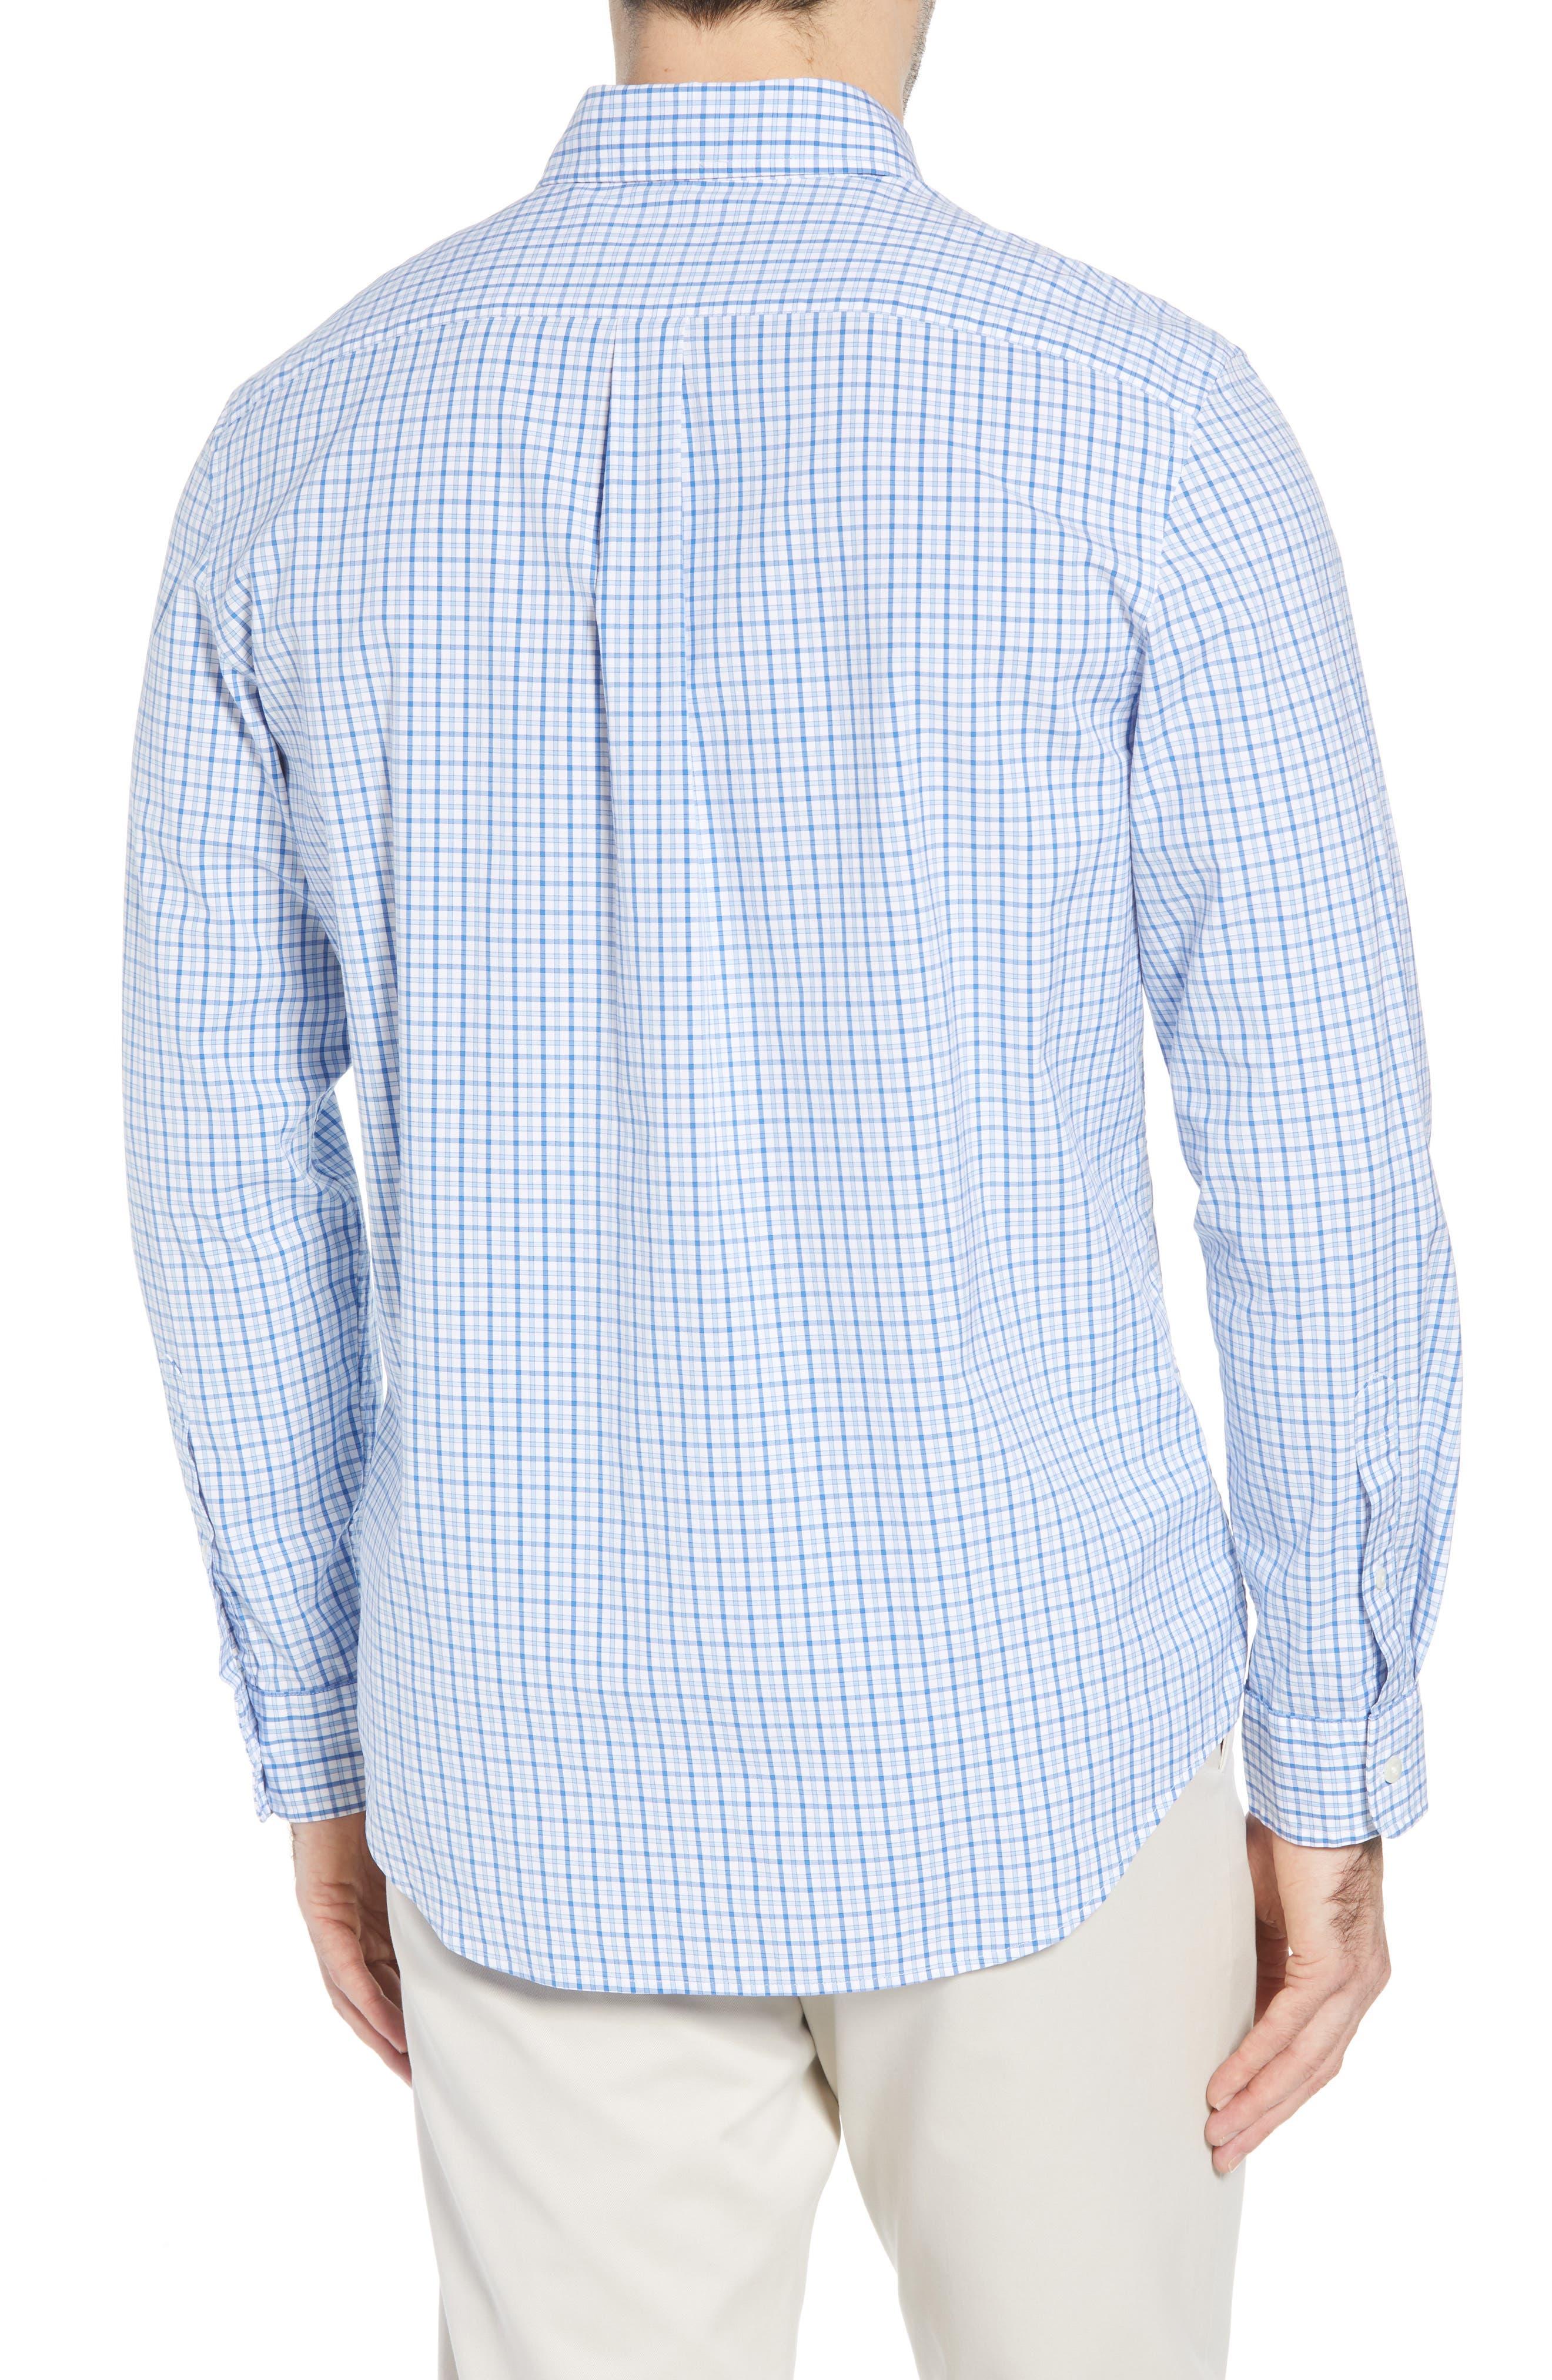 Clark Cove Tucker Classic Fit Check Sport Shirt,                             Alternate thumbnail 3, color,                             Jake Blue